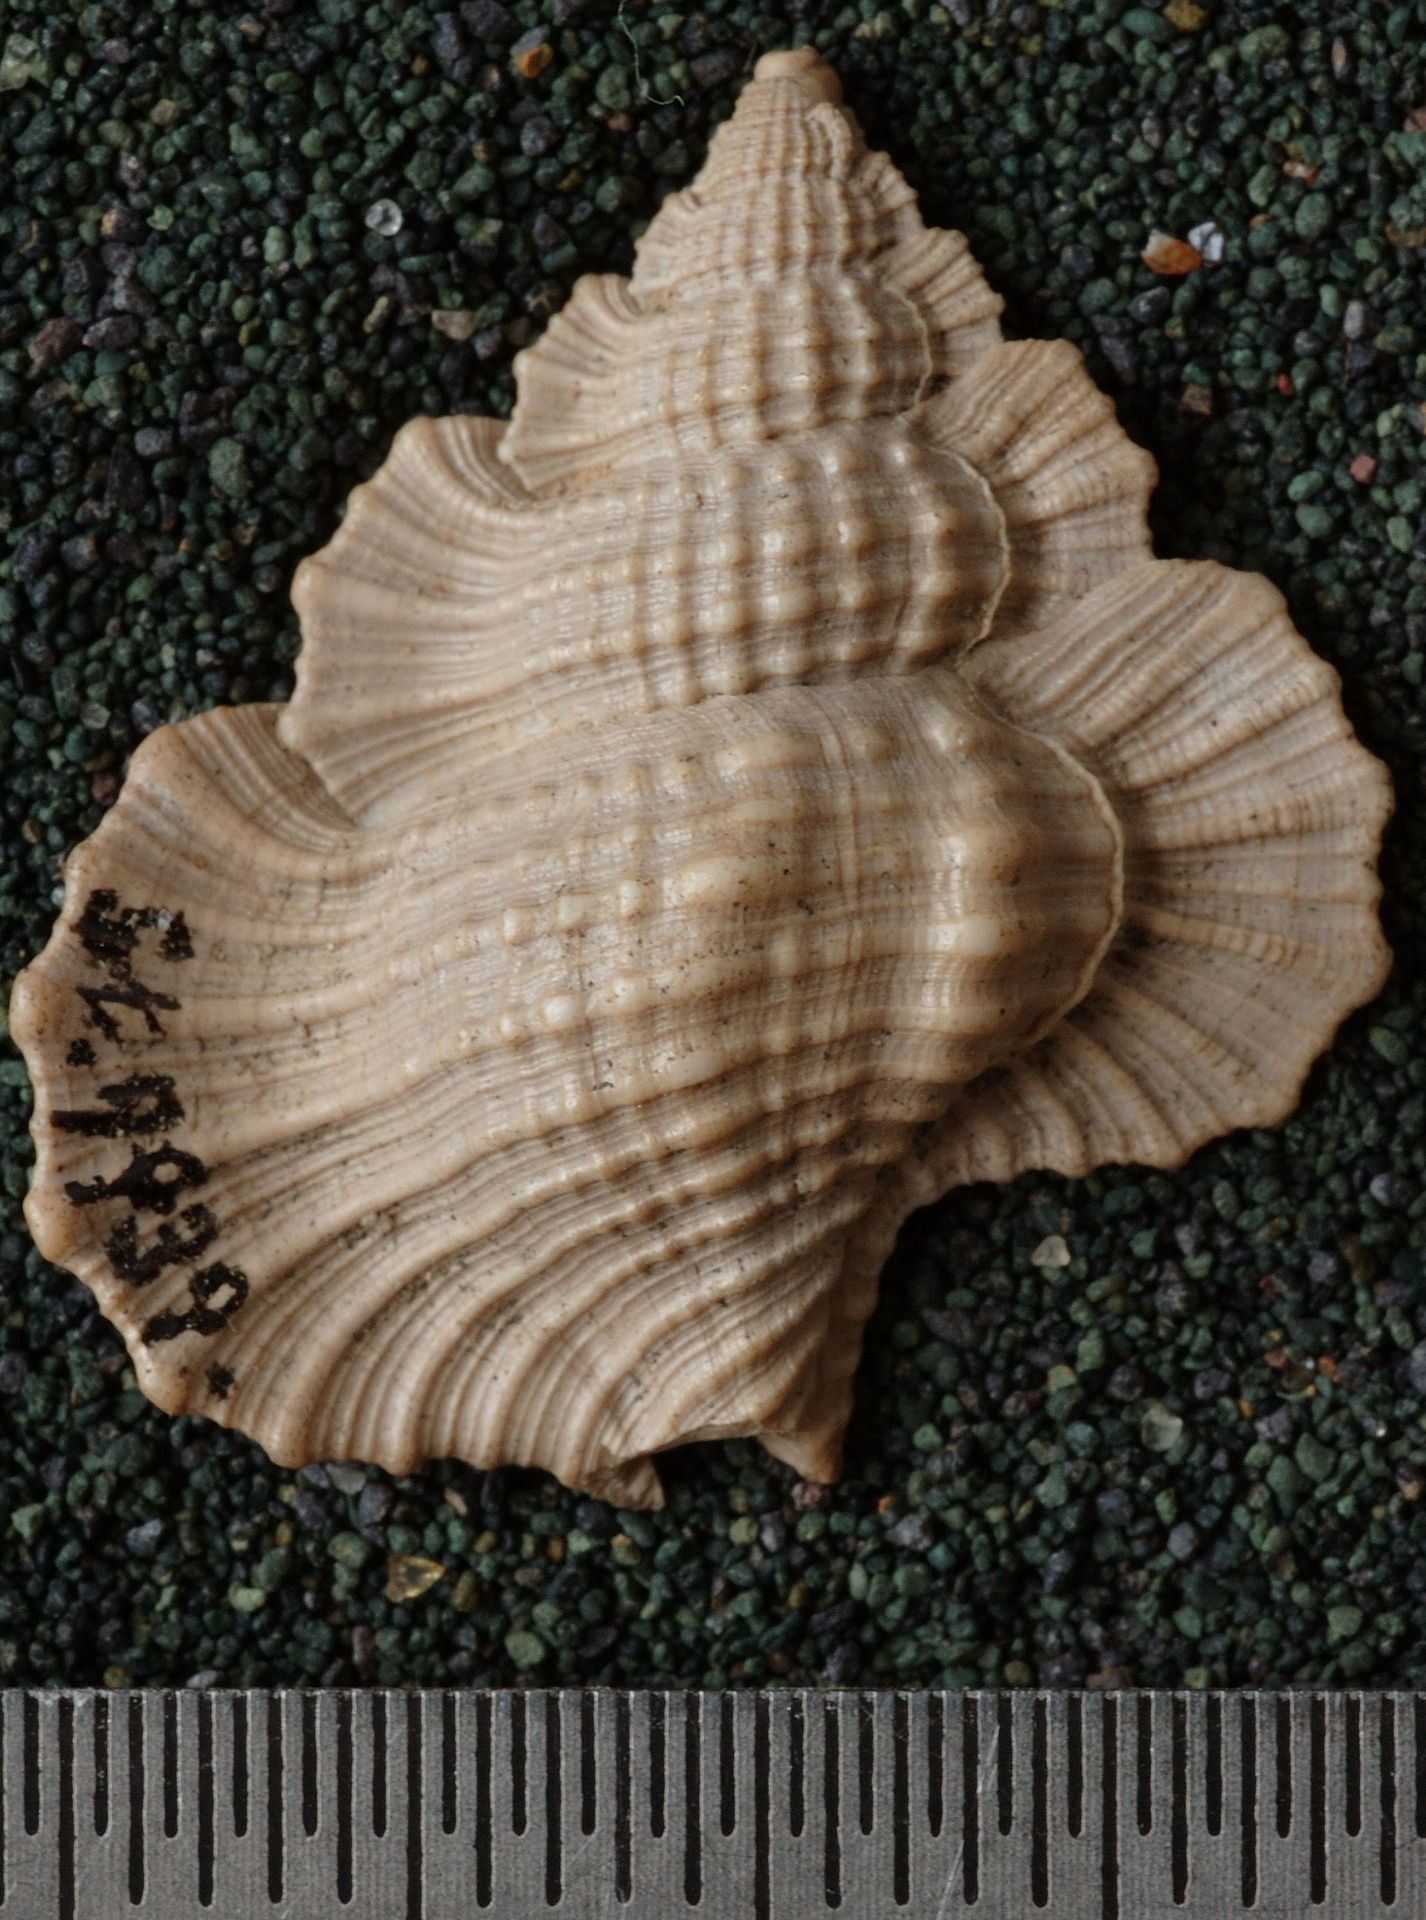 RGM.9939 | Ranella (Biplex) pamotanensis Martin, 1899